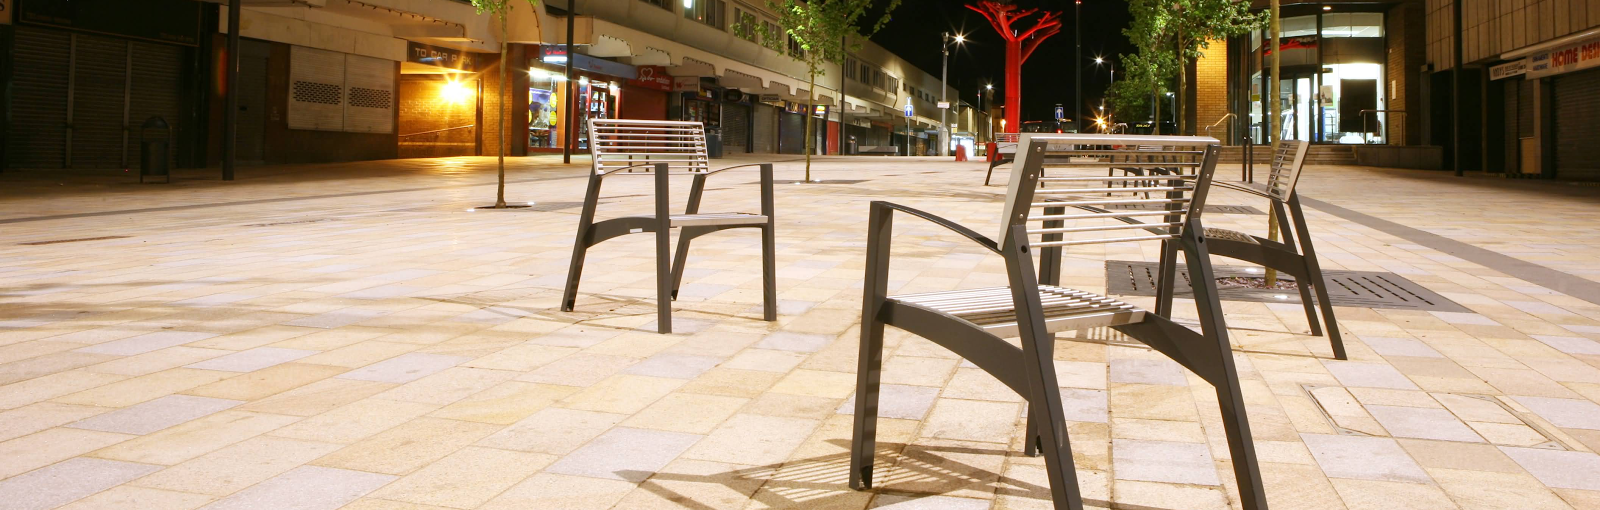 External & Urban Area Lighting Design Service